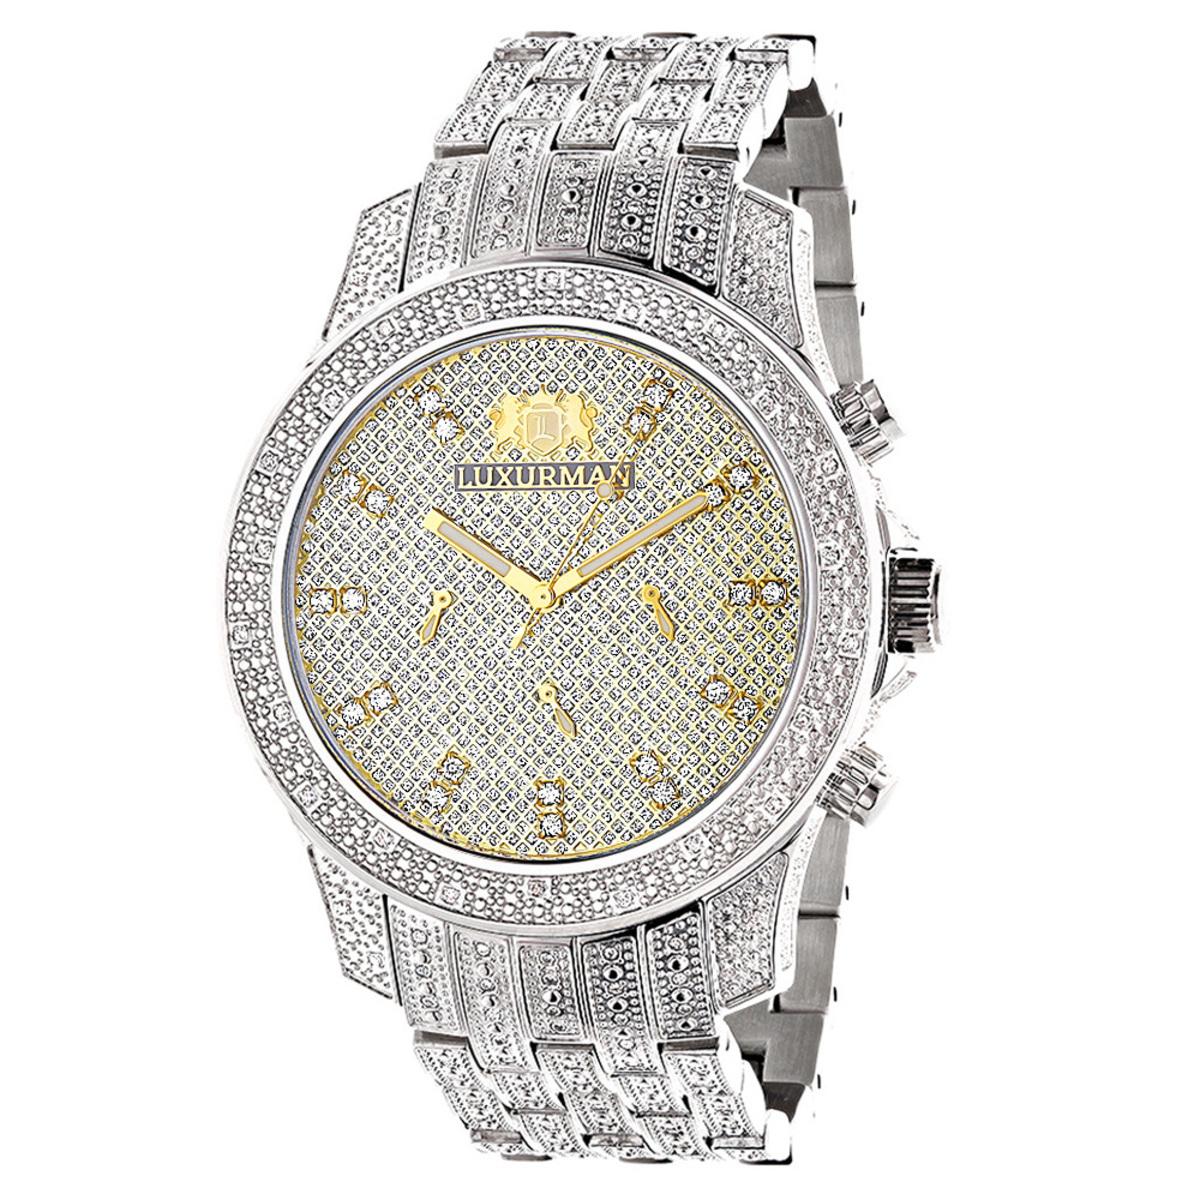 Luxurman Wrist Watches Mens Diamond Watch 1.25ct